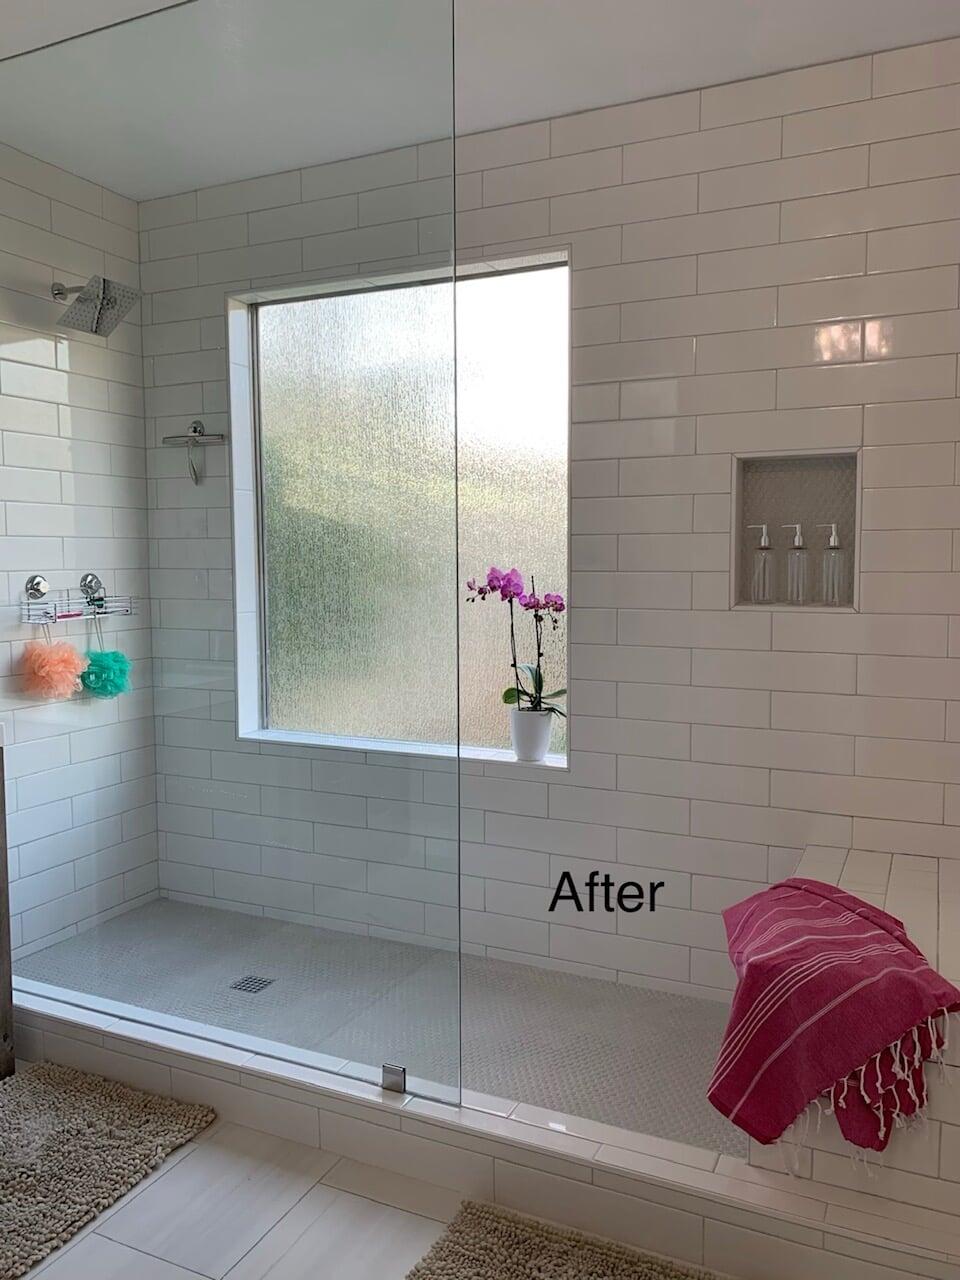 After a professional bathroom renovation in Glendale, AZ